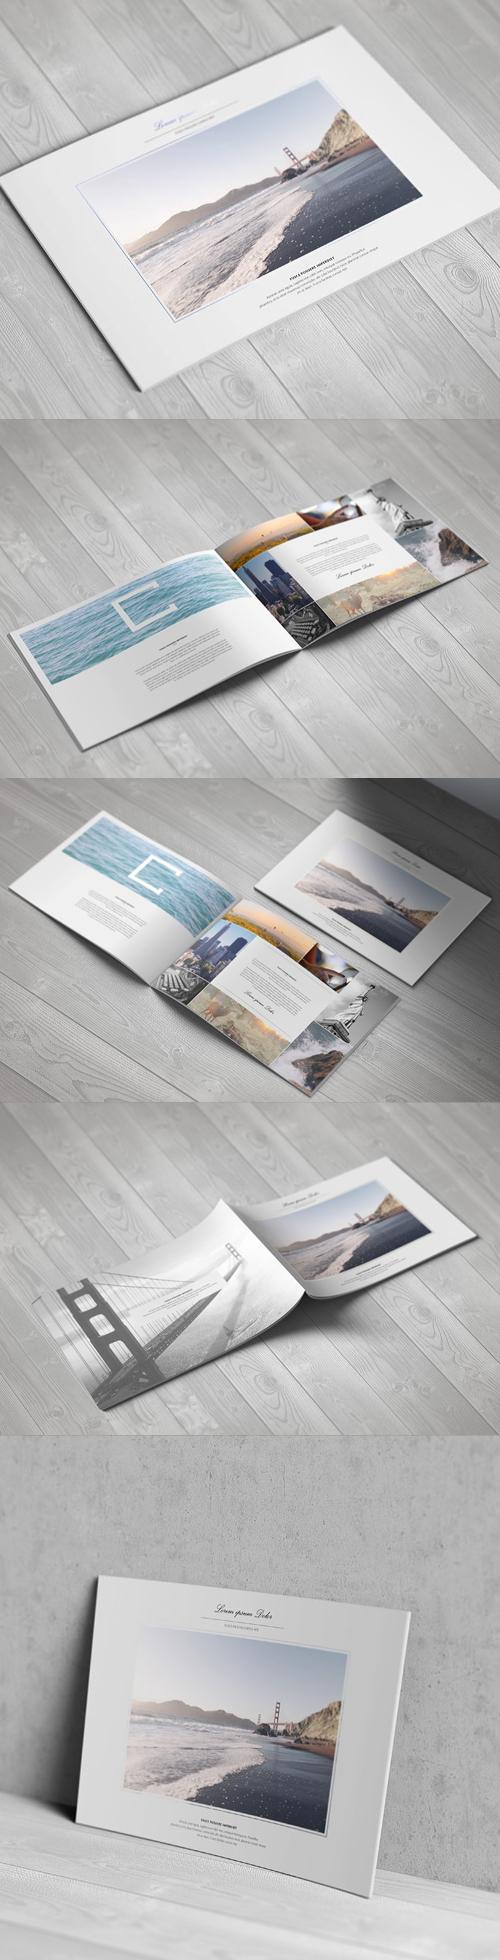 A4 Landscape Brochure Mock-Up Template